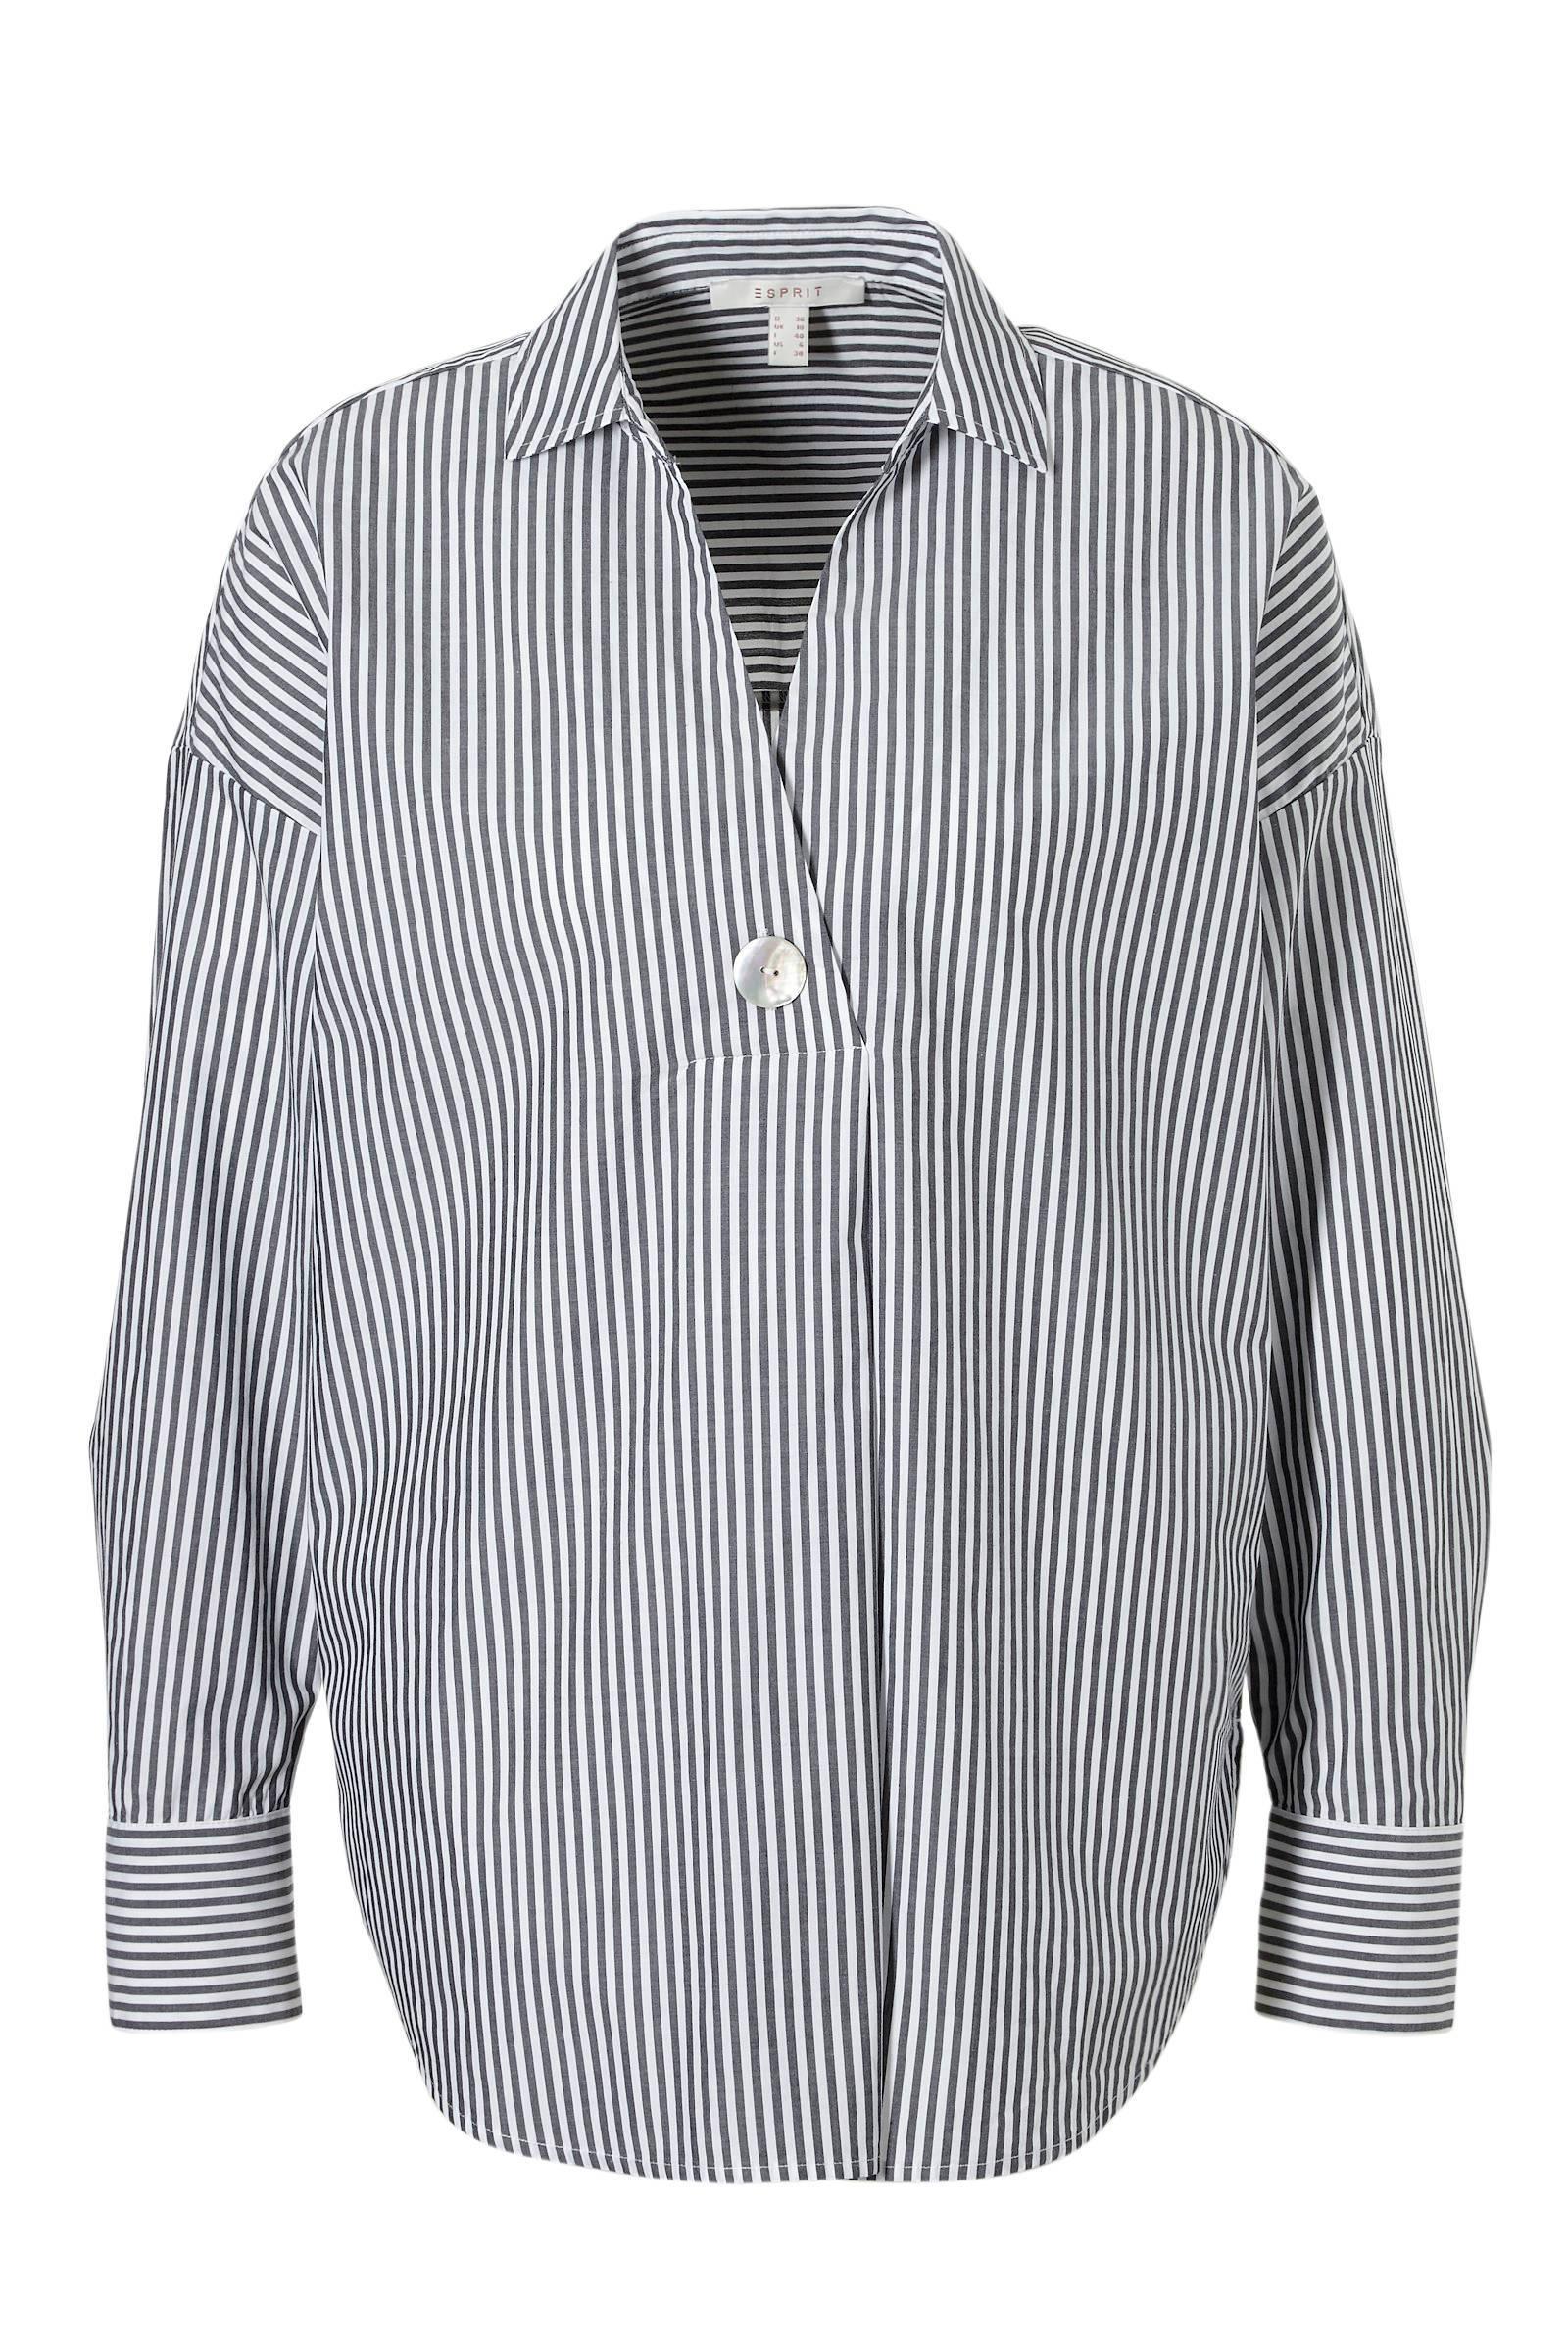 Grijs wit gestreepte blouse